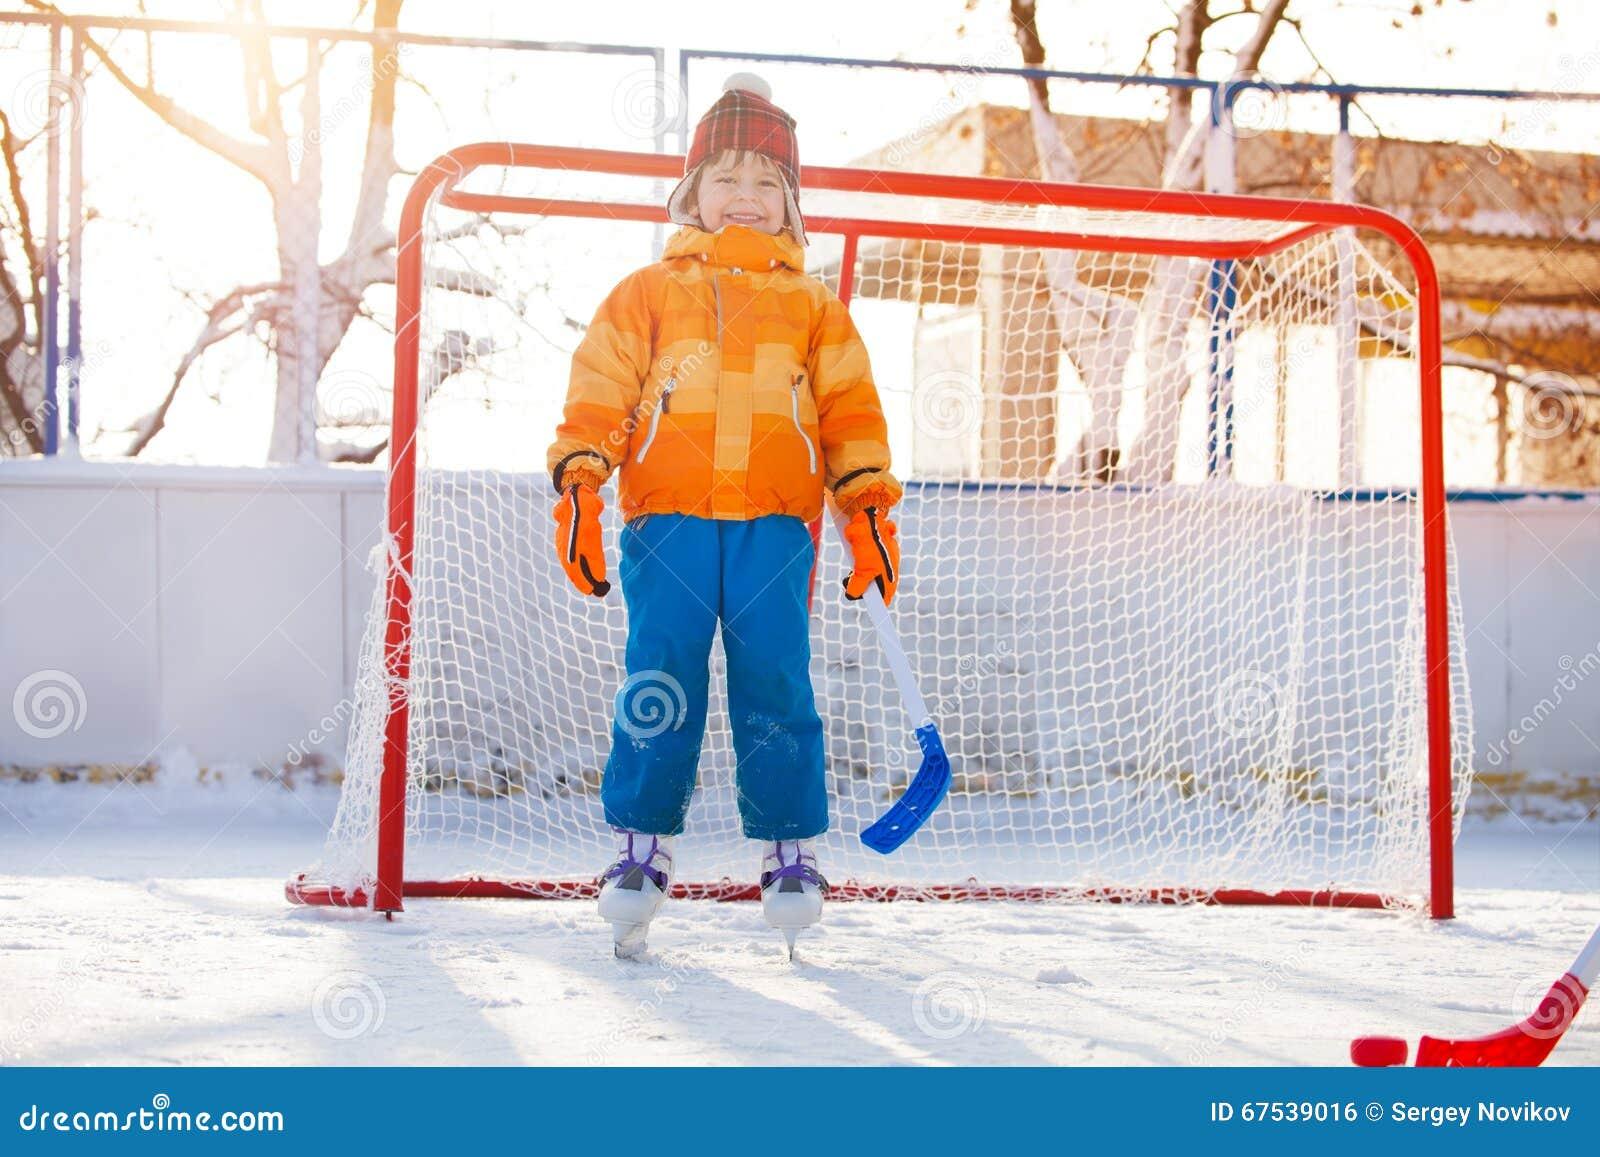 Little boy play hockey standing in gates